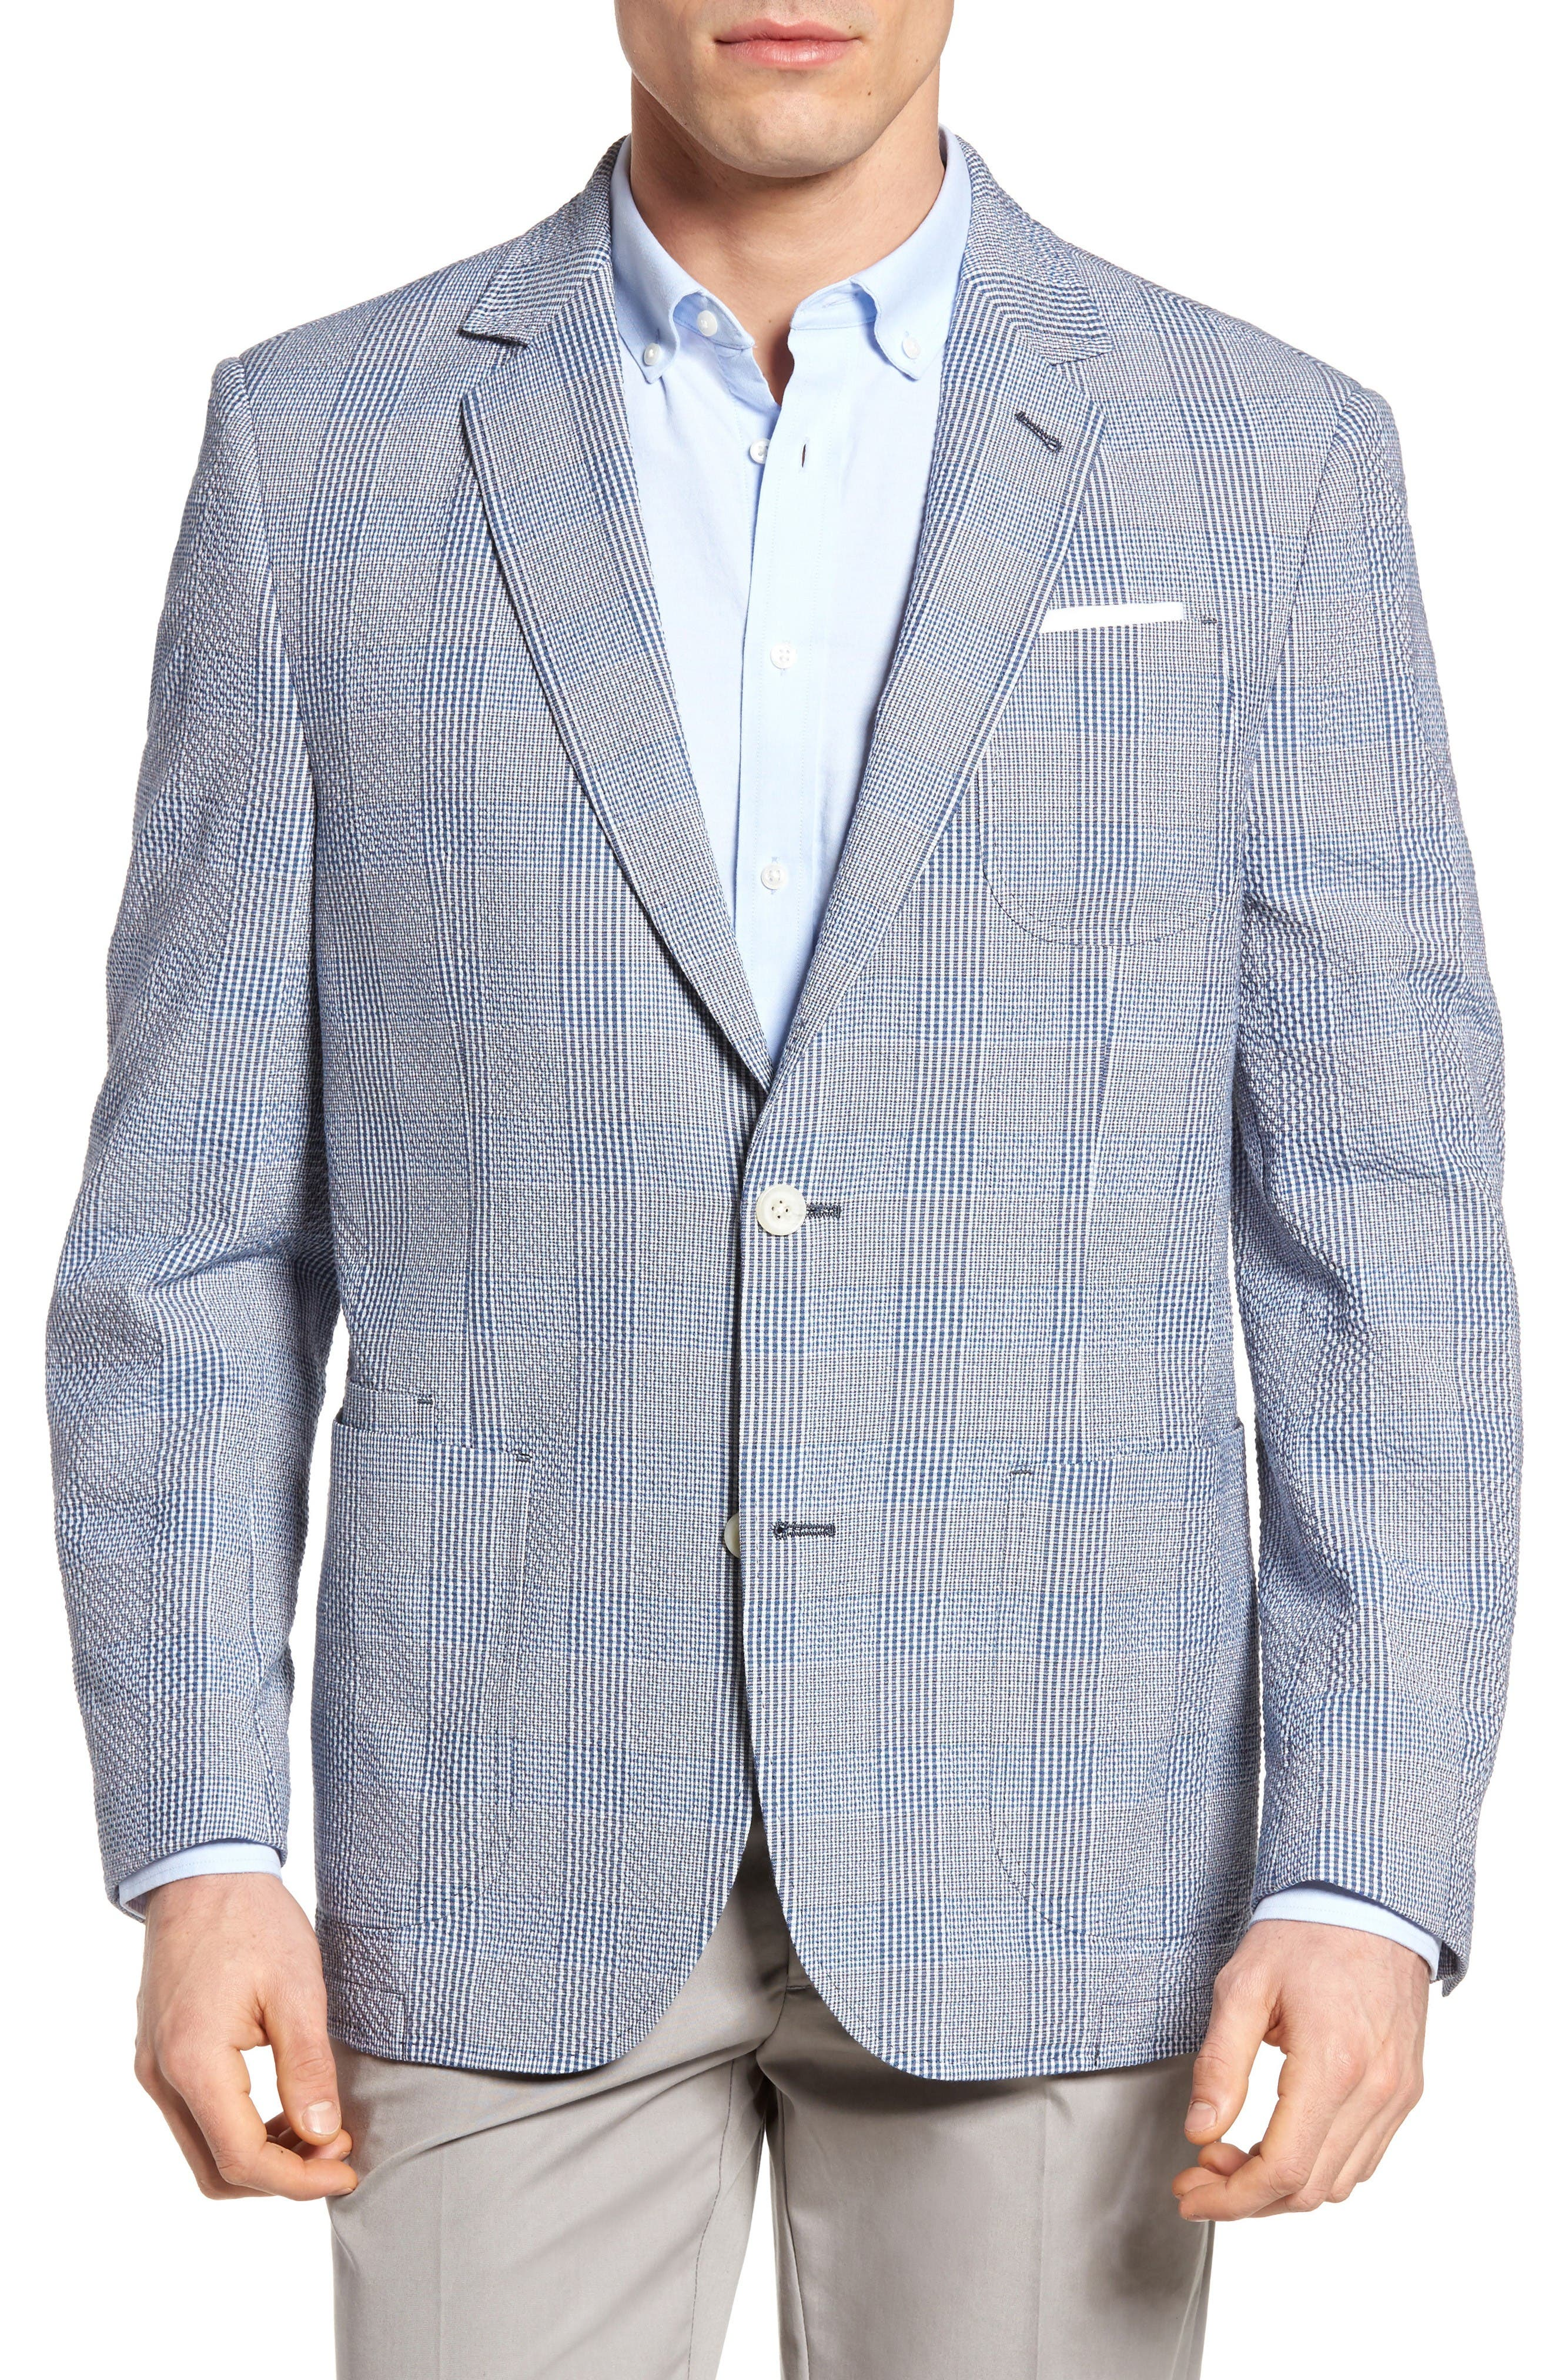 Babbitt Plaid Seersucker Sport Coat,                         Main,                         color, Blue